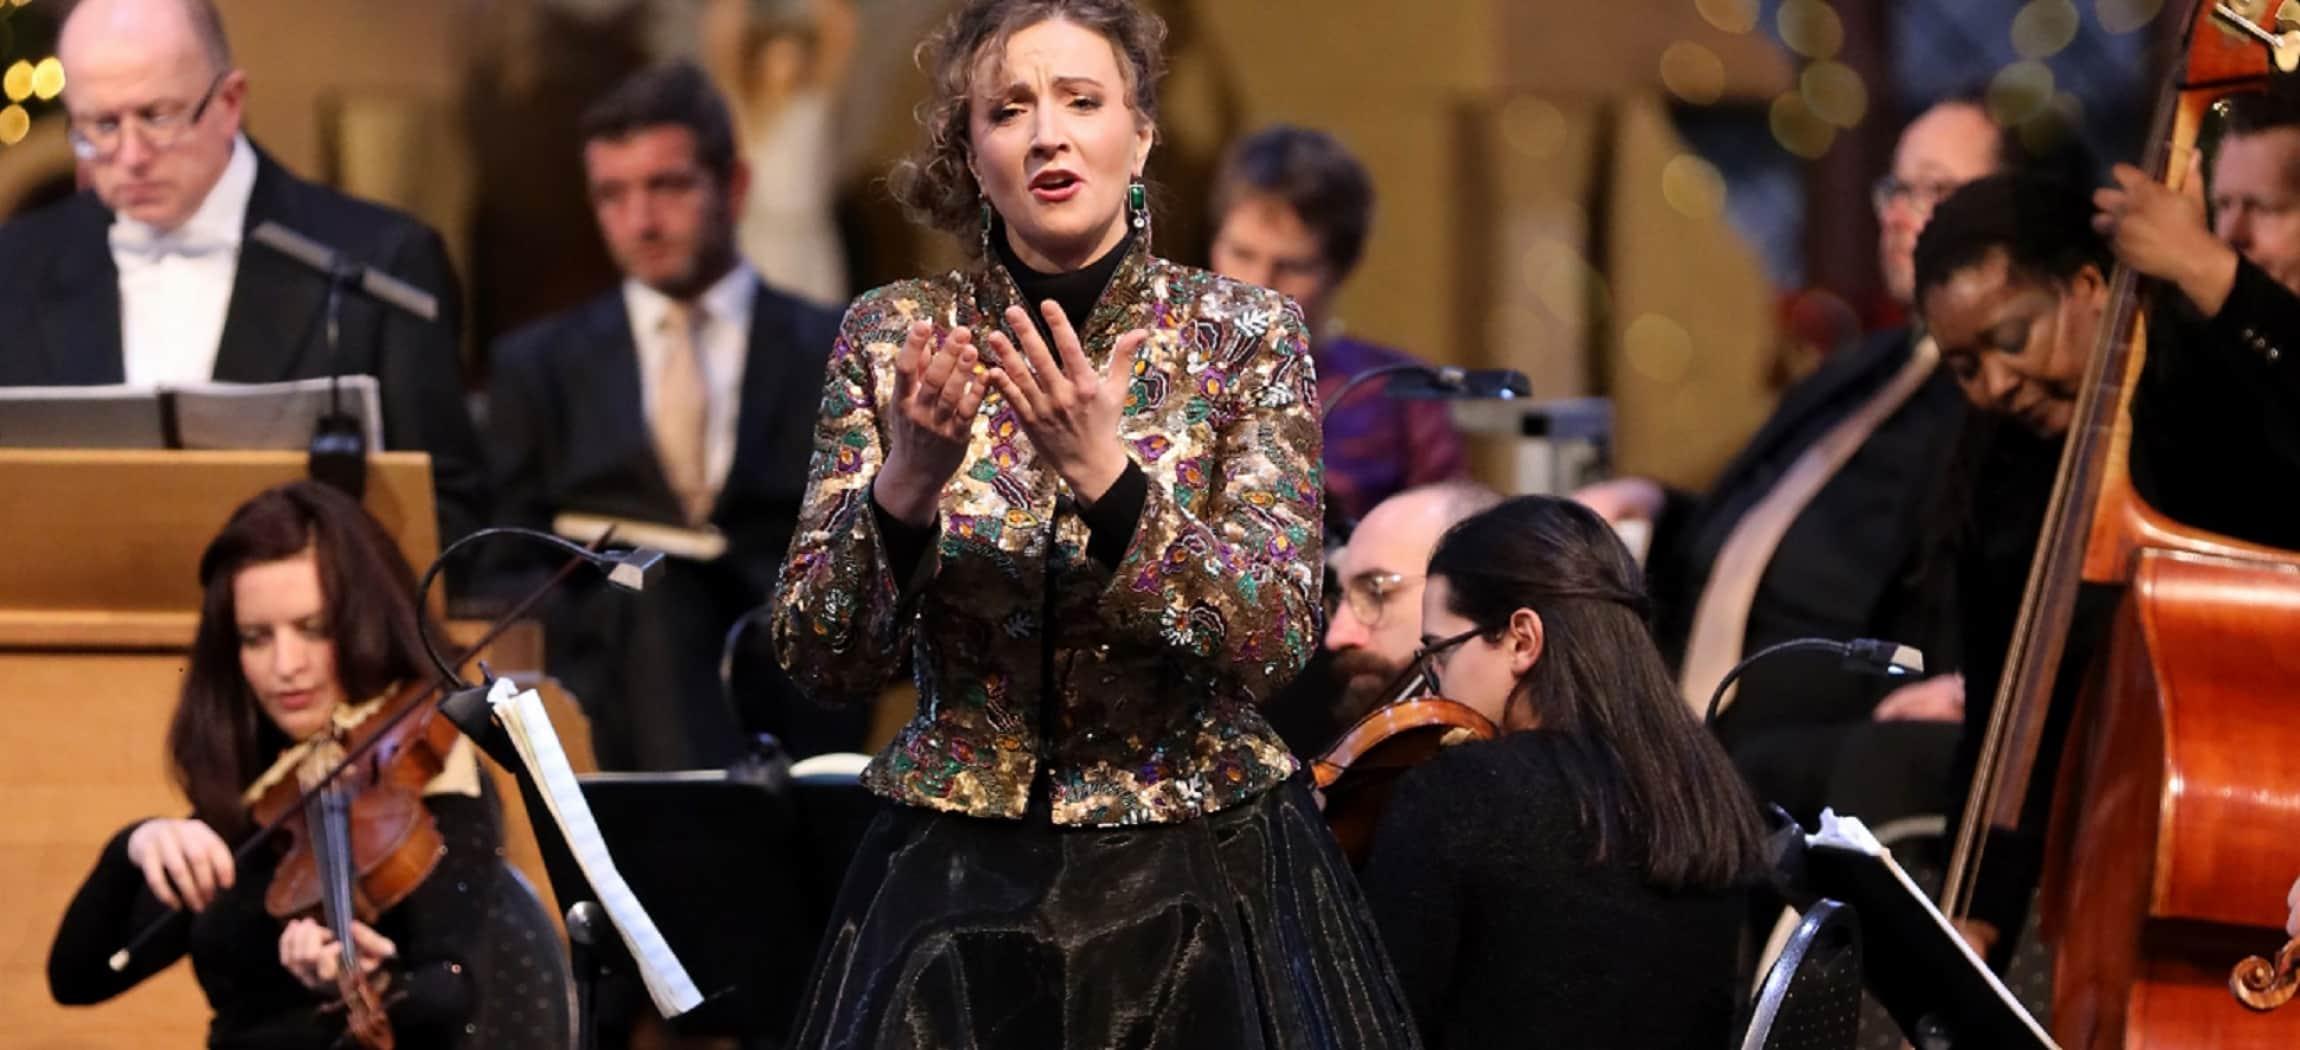 Sopraan Olga Zinovieva en countertenor Sytse Buwalda operazangers paarse achtergrond